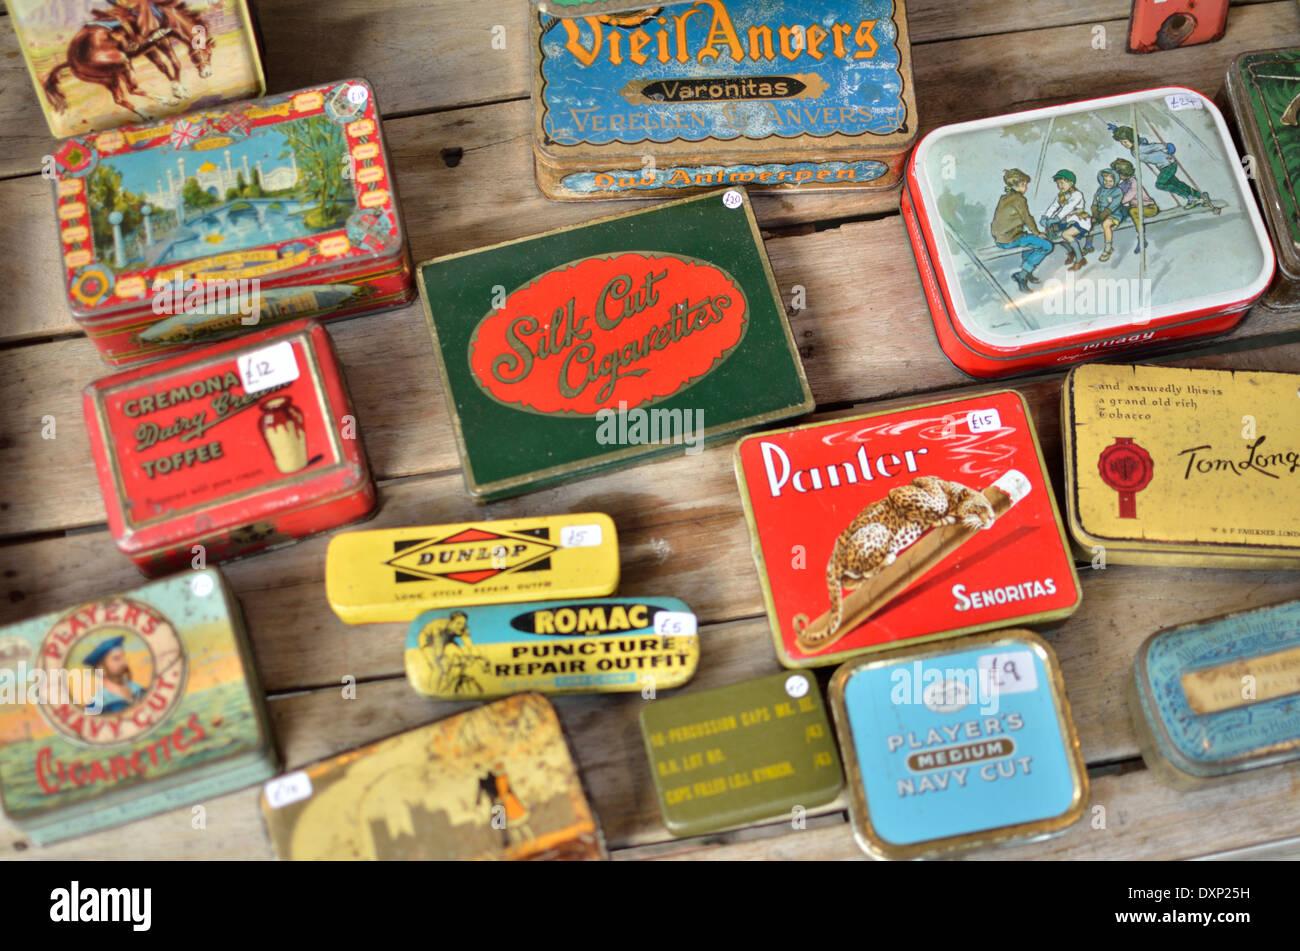 Colourful old tin boxes on a market stall, Portobello Road, Notting Hill, London, UK. - Stock Image